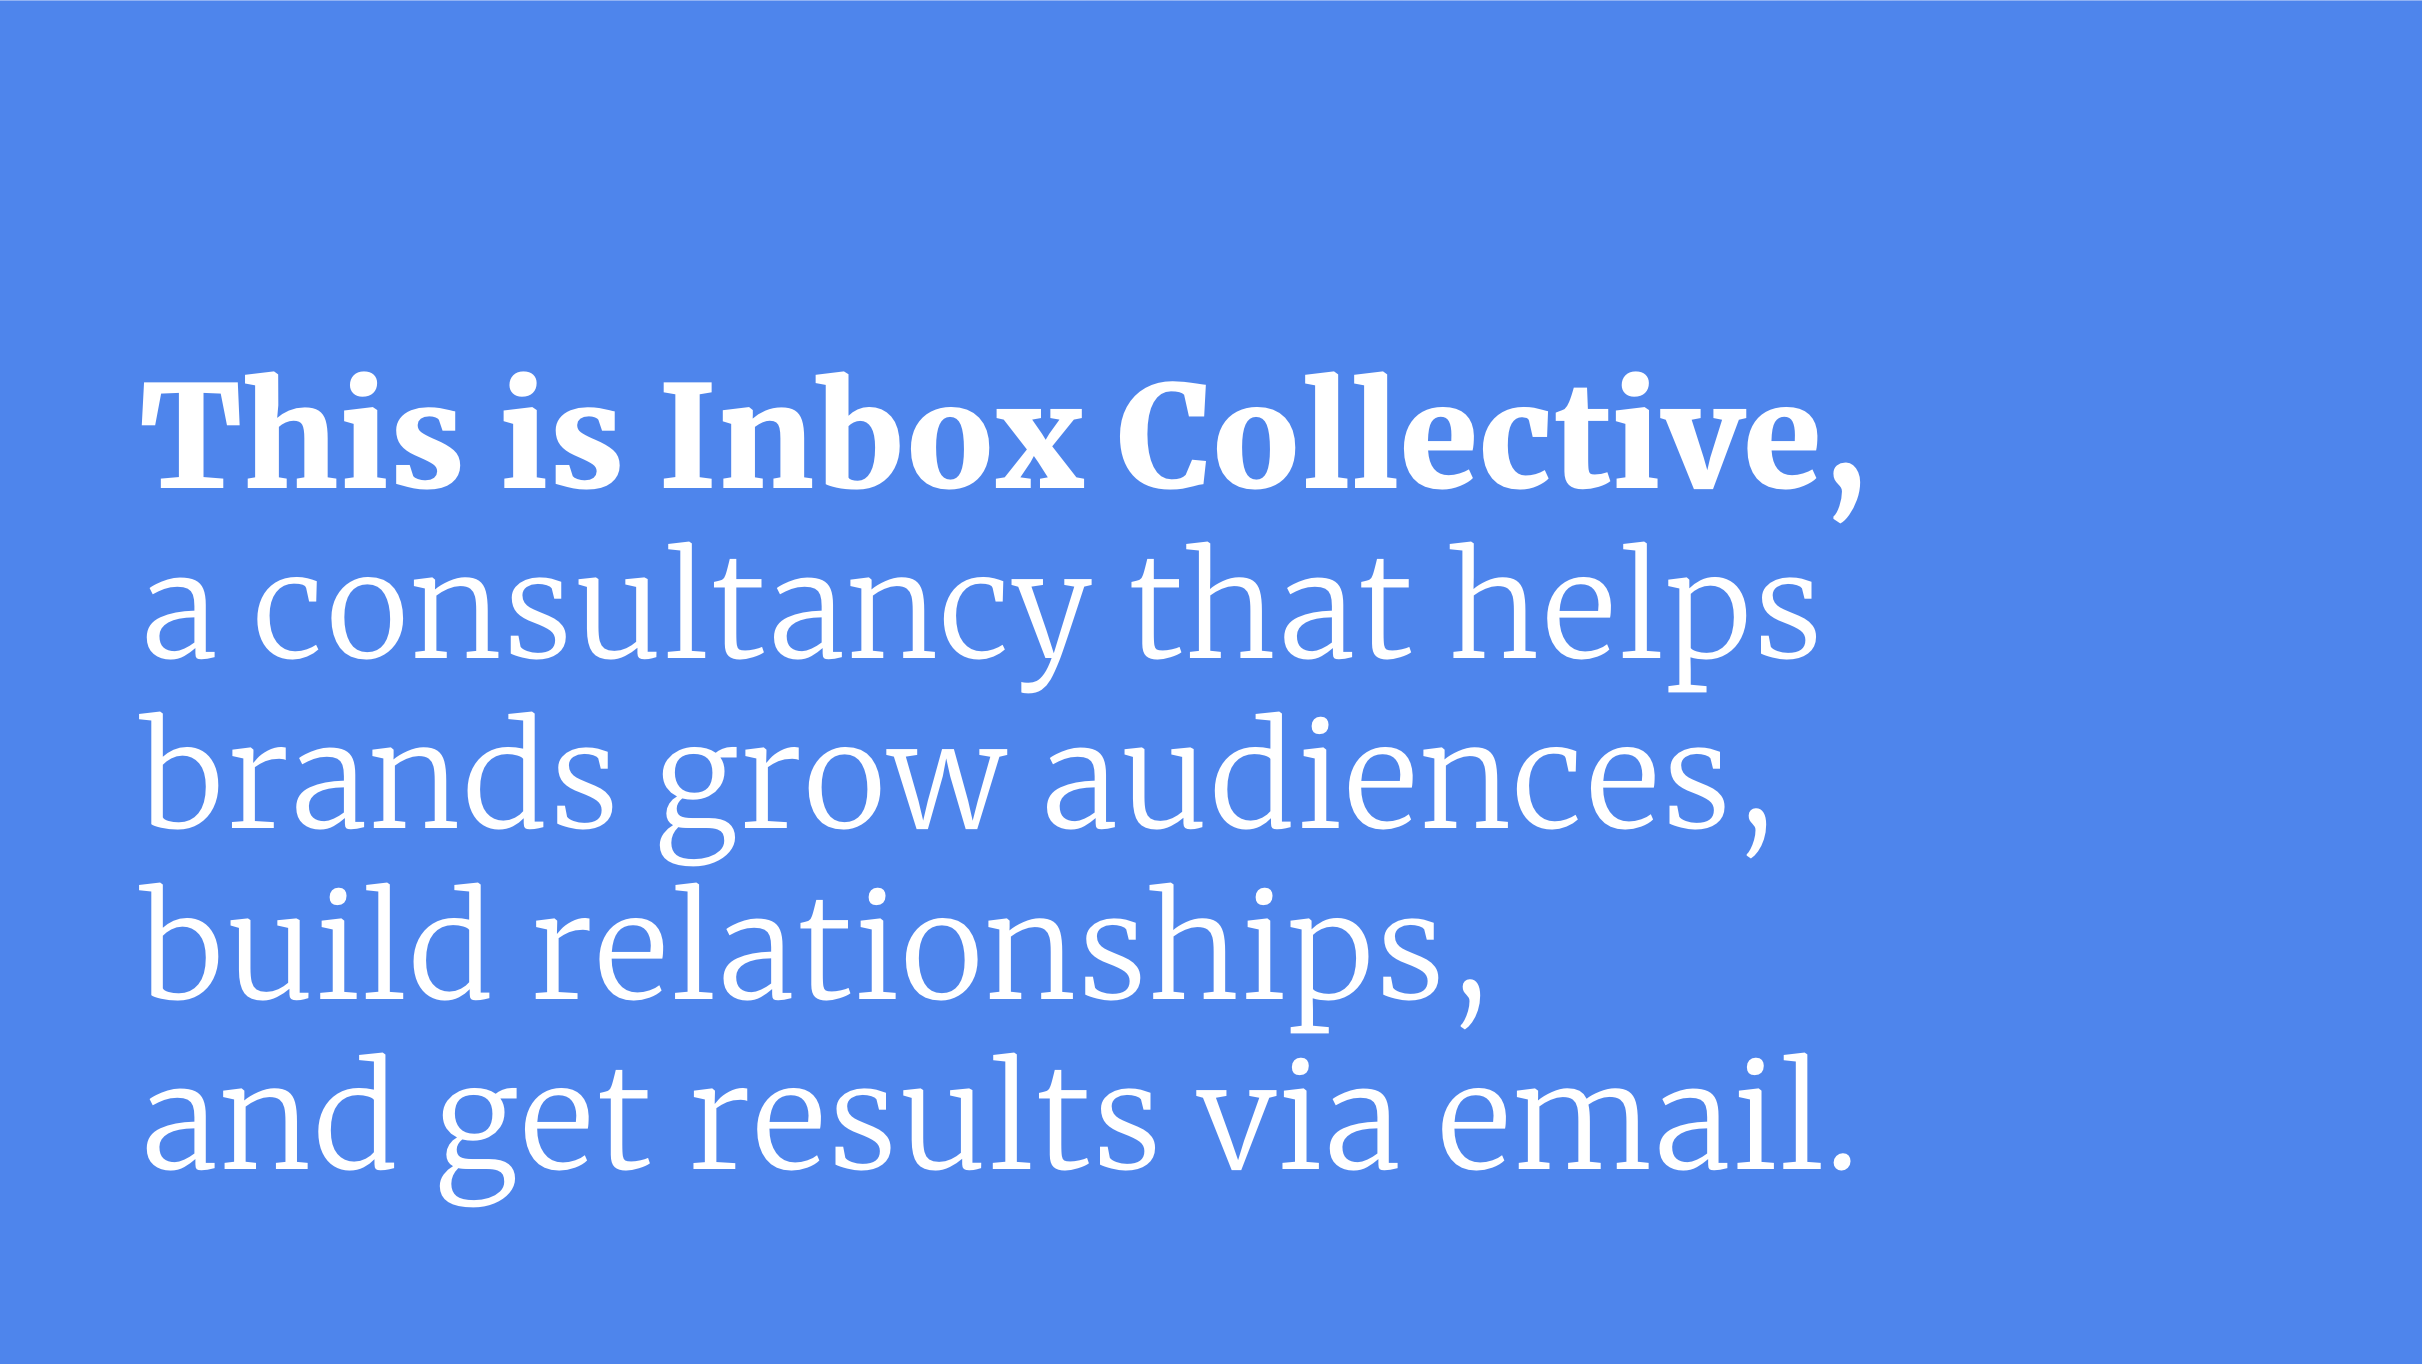 Inbox Collective